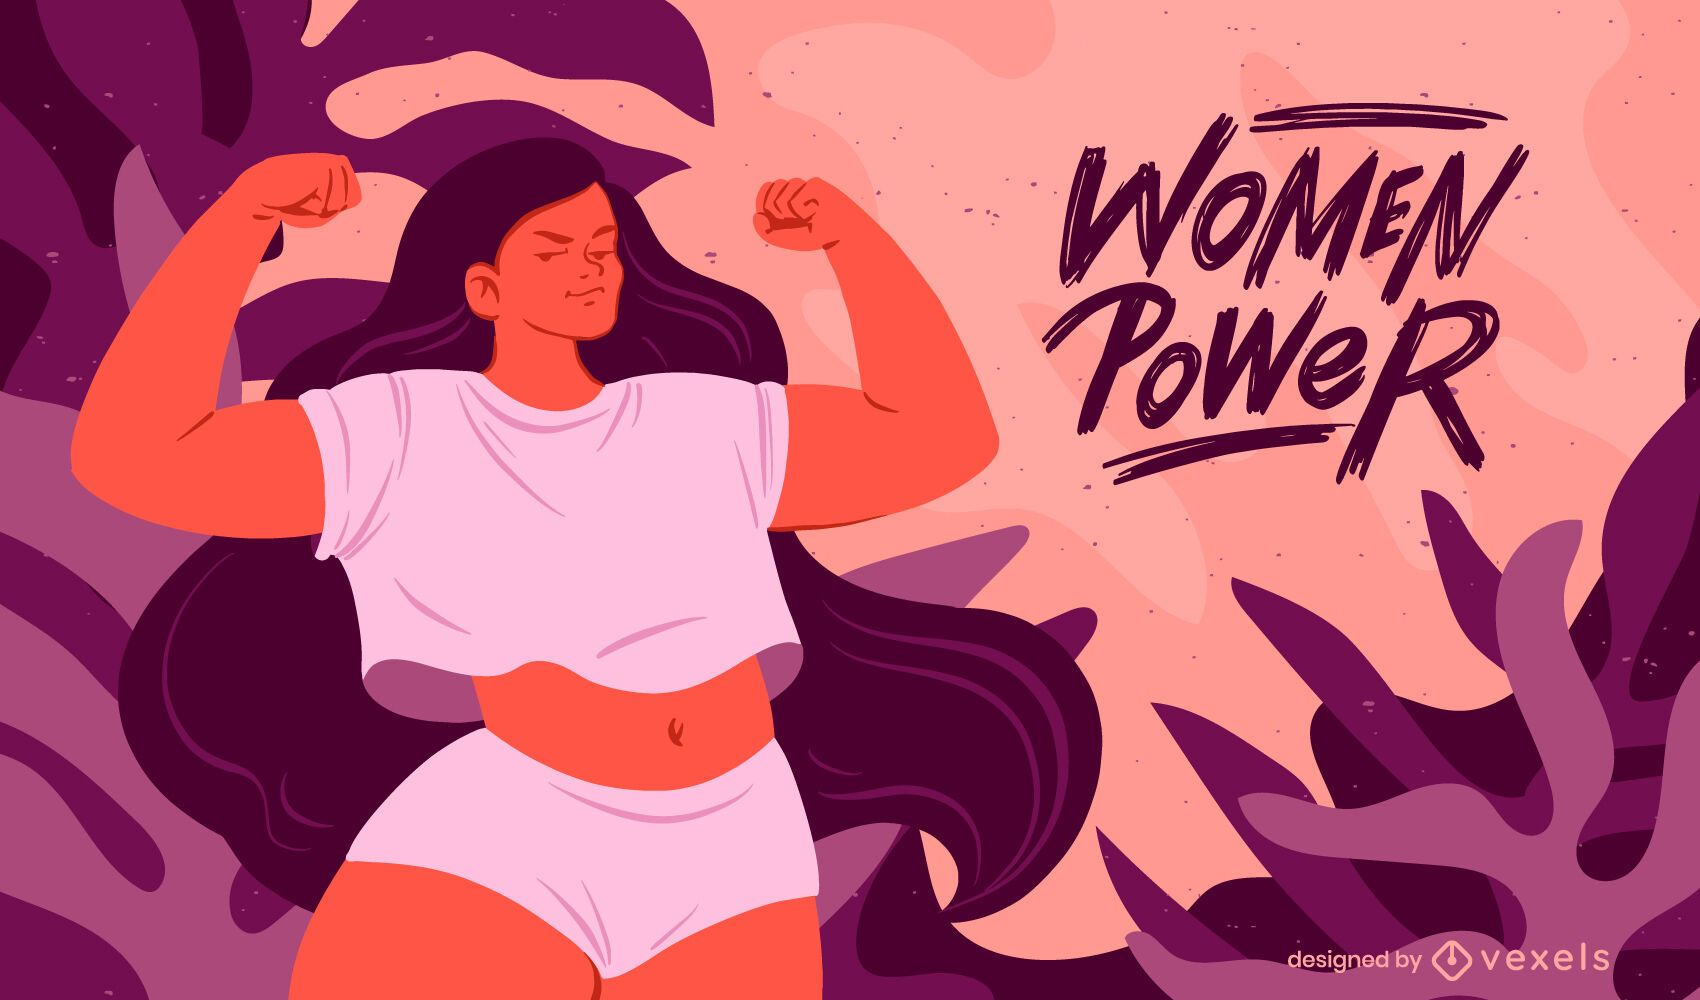 Flexed bicep women power illustration